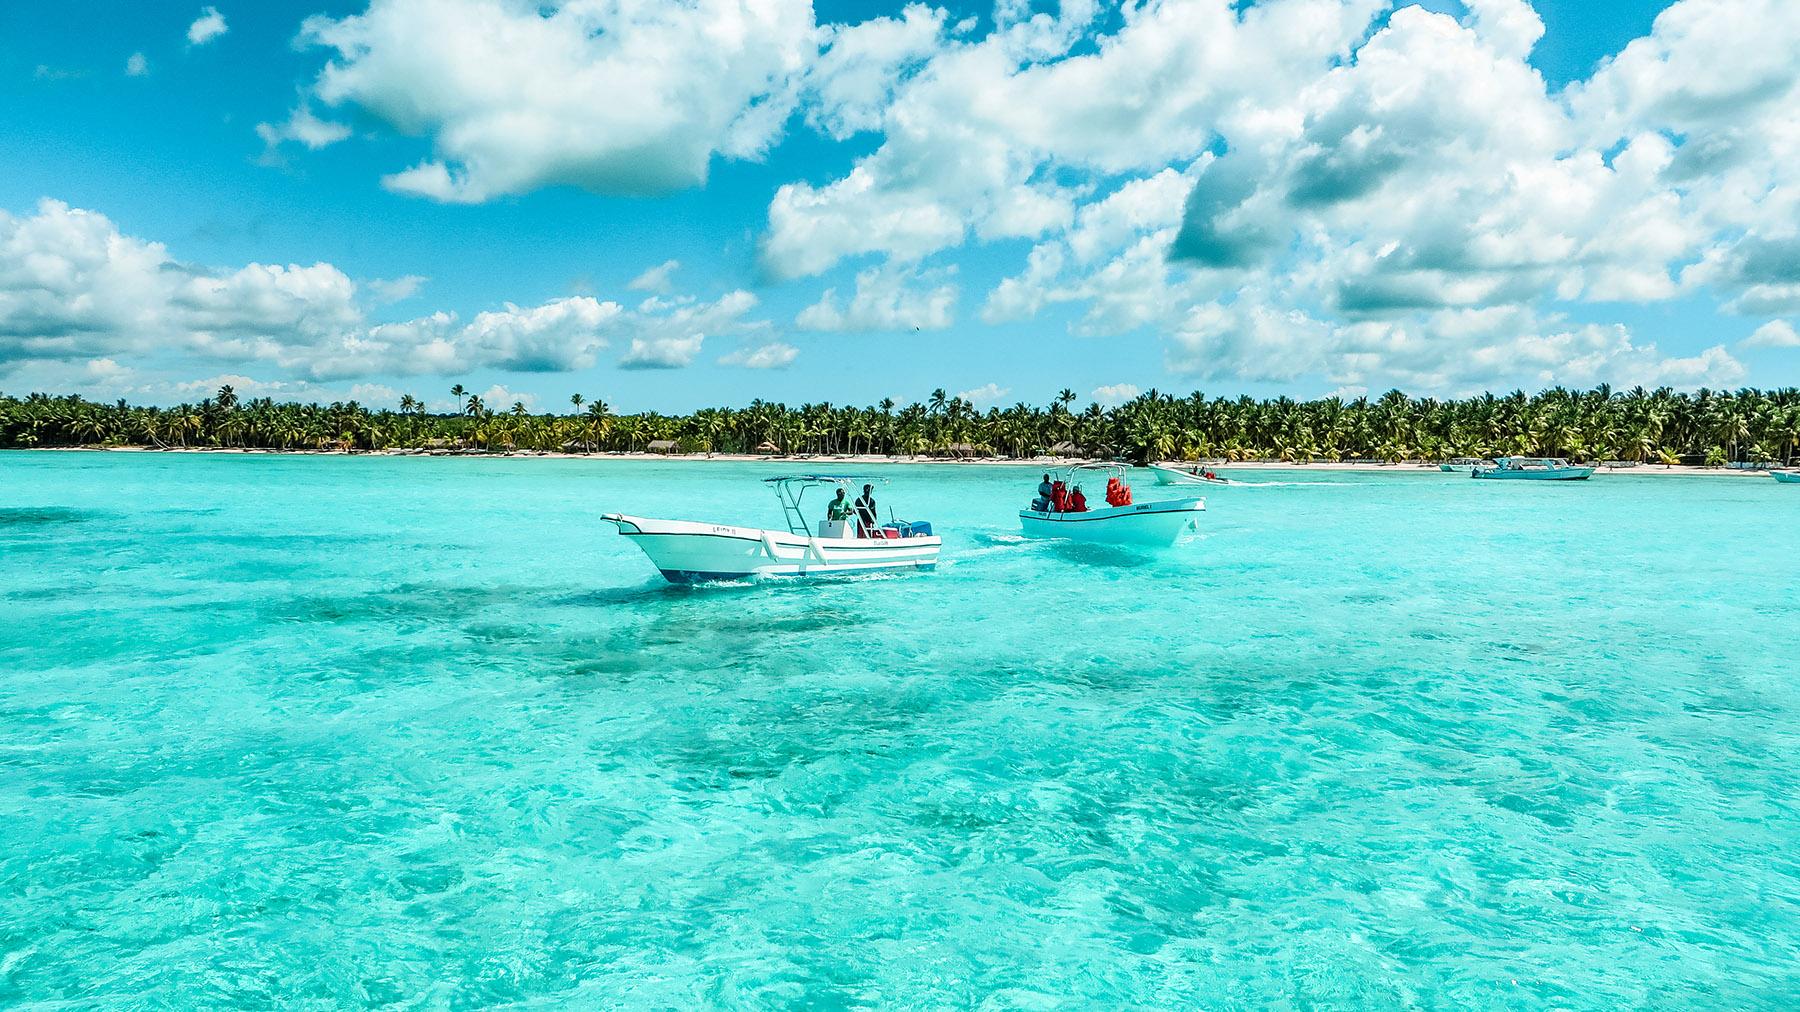 Dominikanische Republik Isla Saona Pool Boote